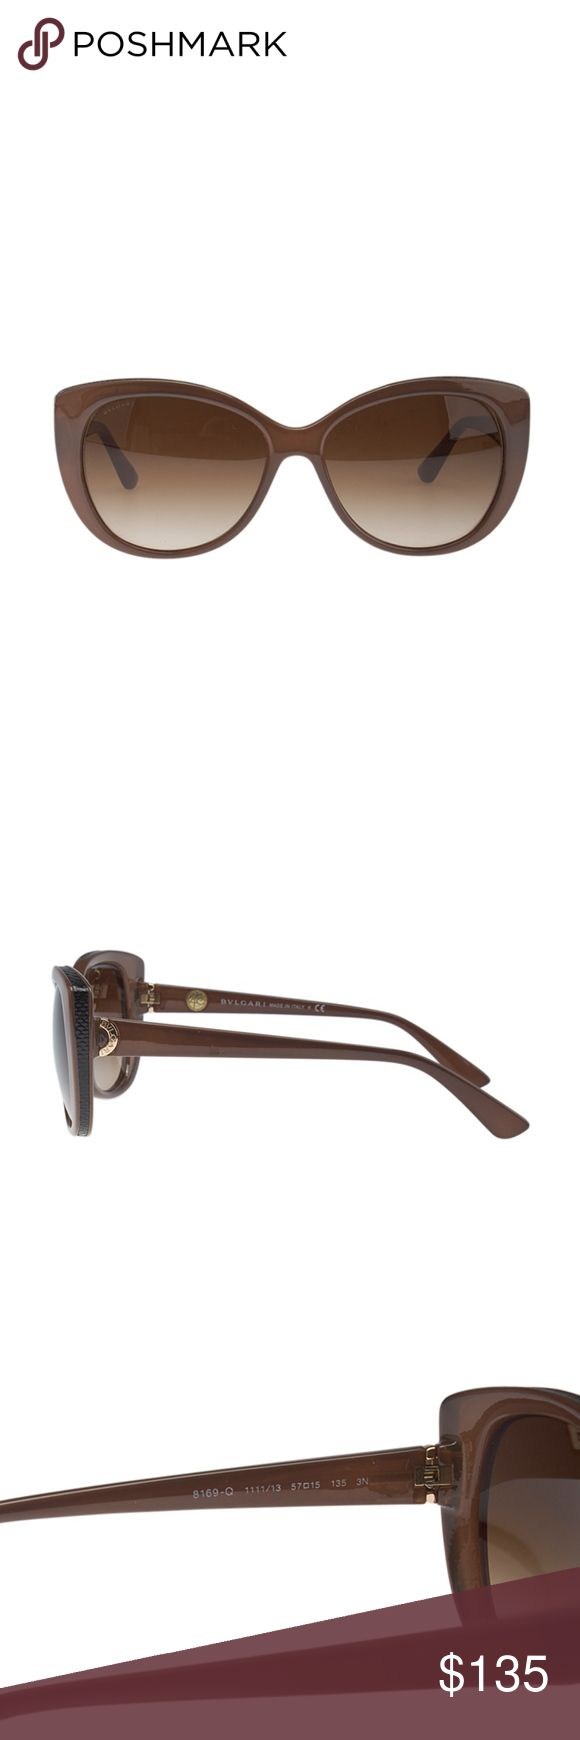 best 25+ lens and frames ideas on pinterest | mirrored sunglasses